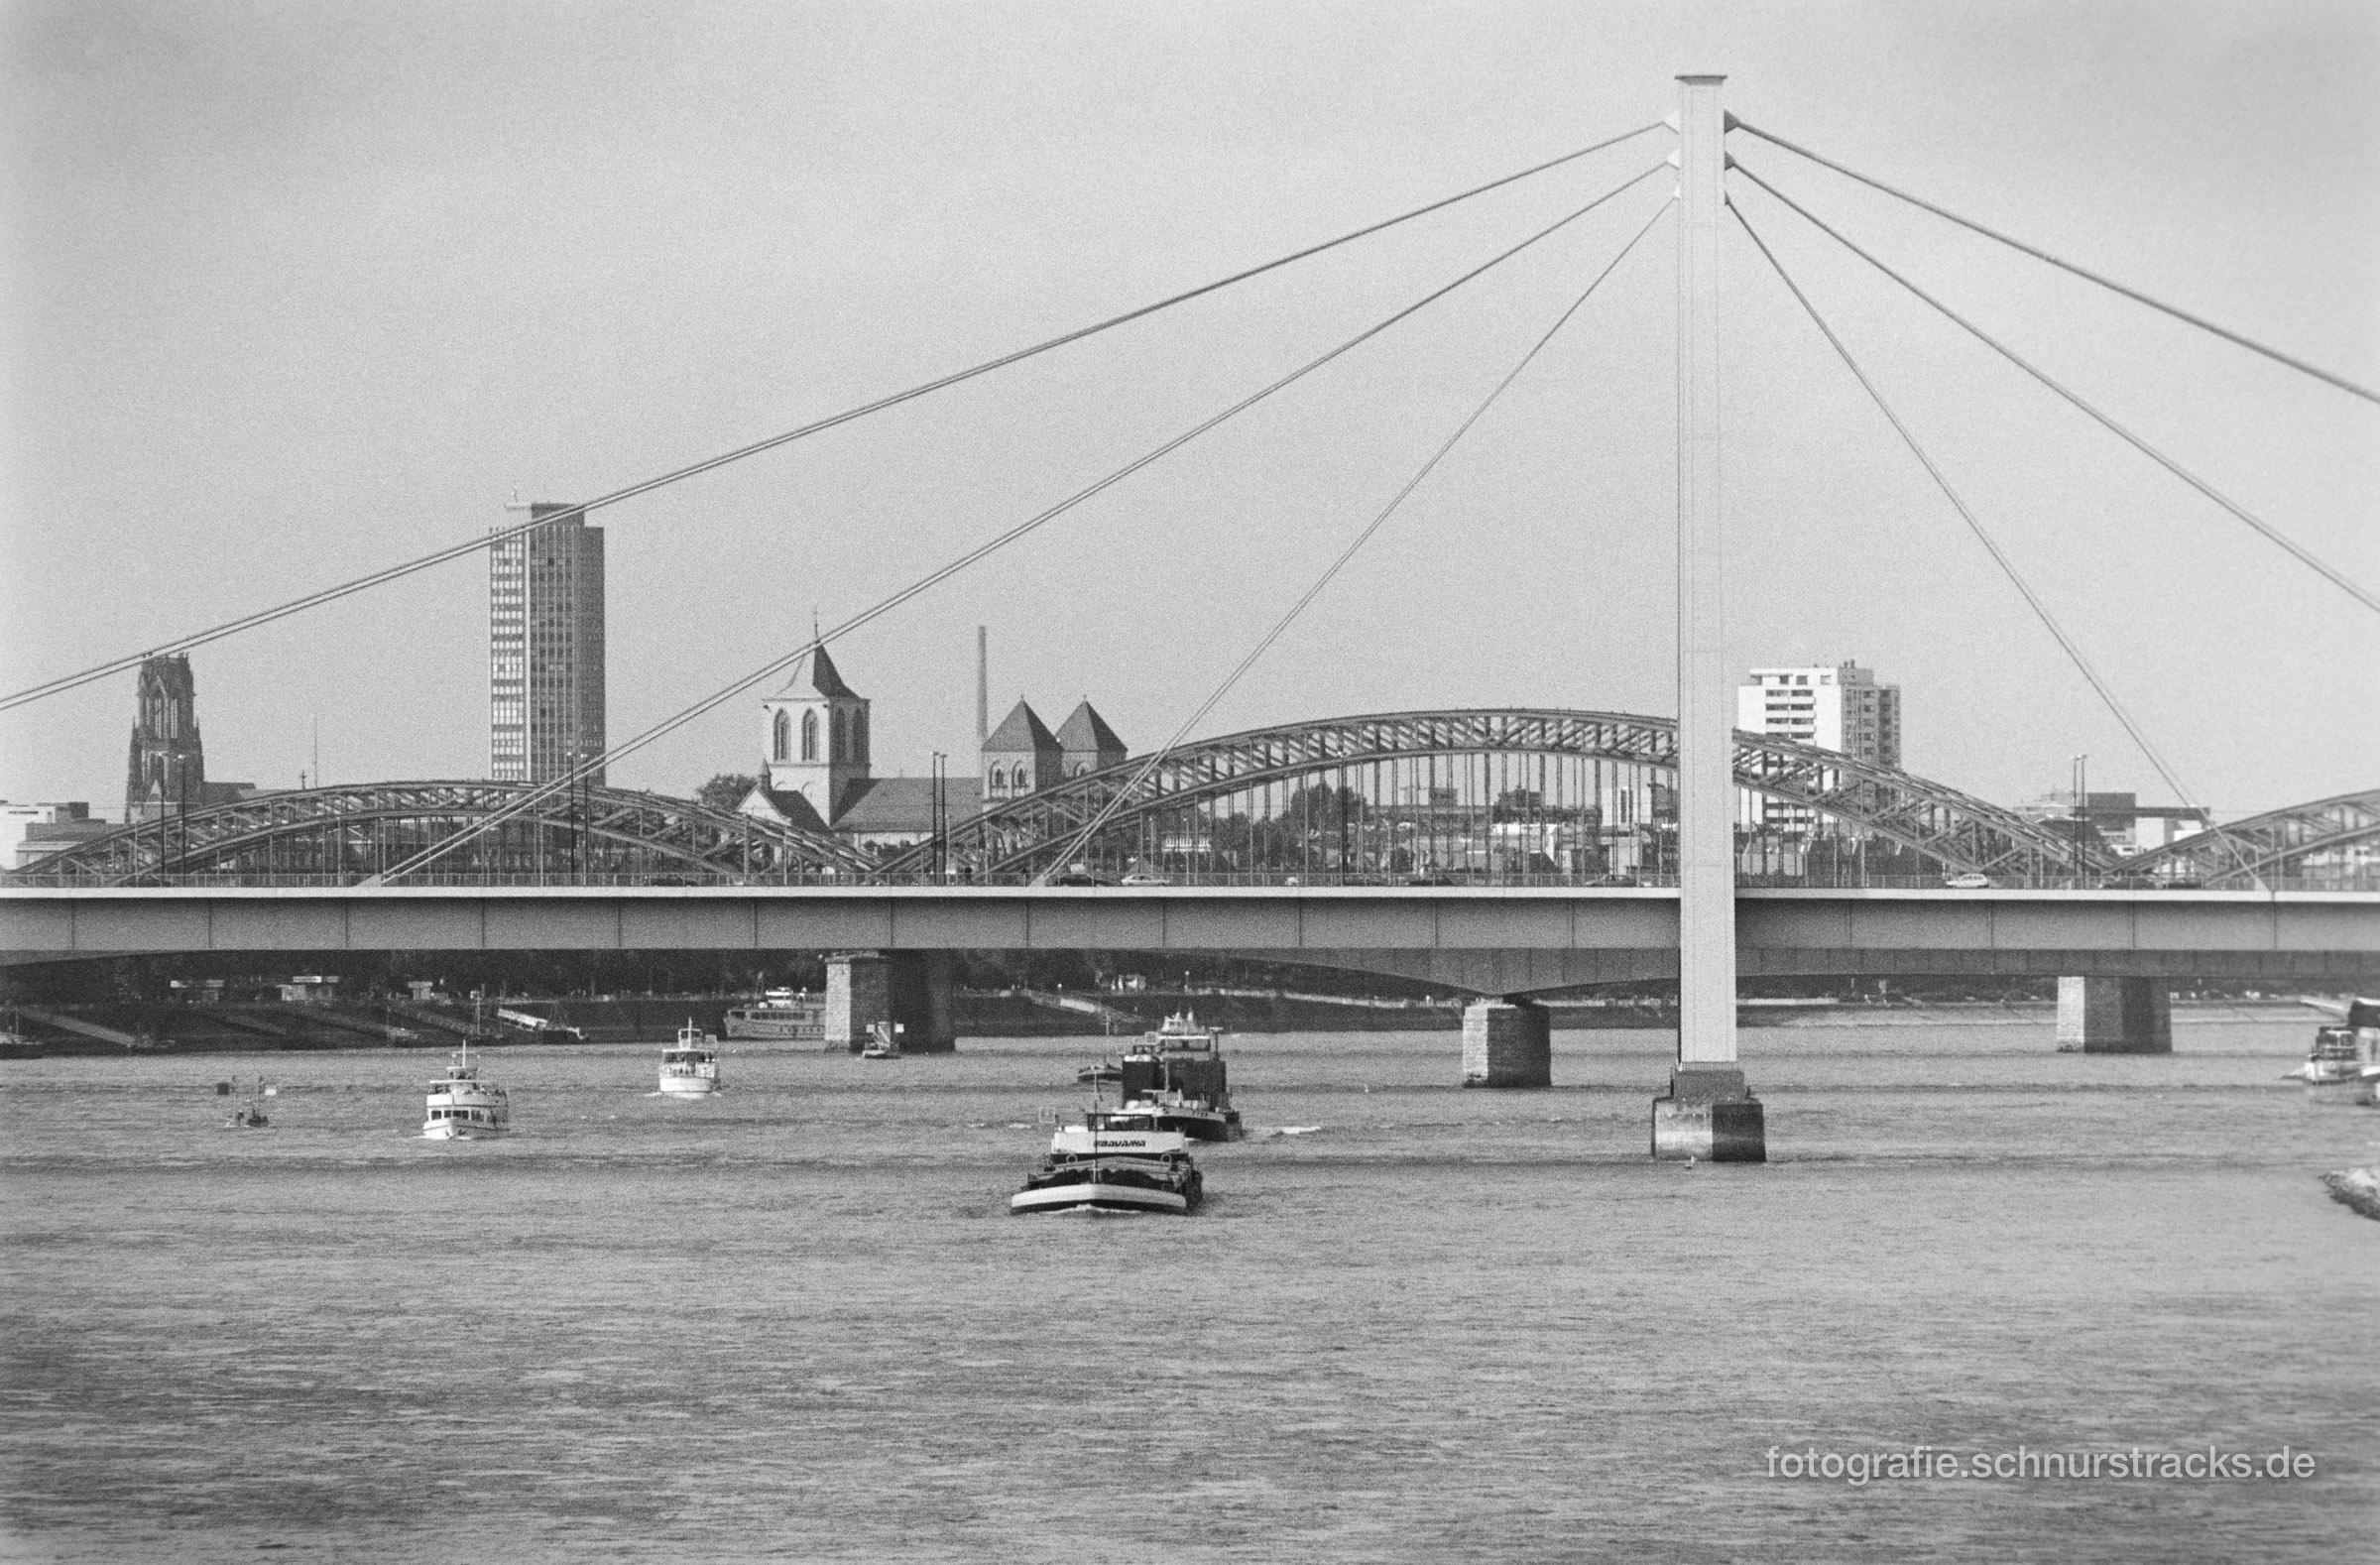 Rheinschifffahrt an der Severinsbrücke in Köln 1994